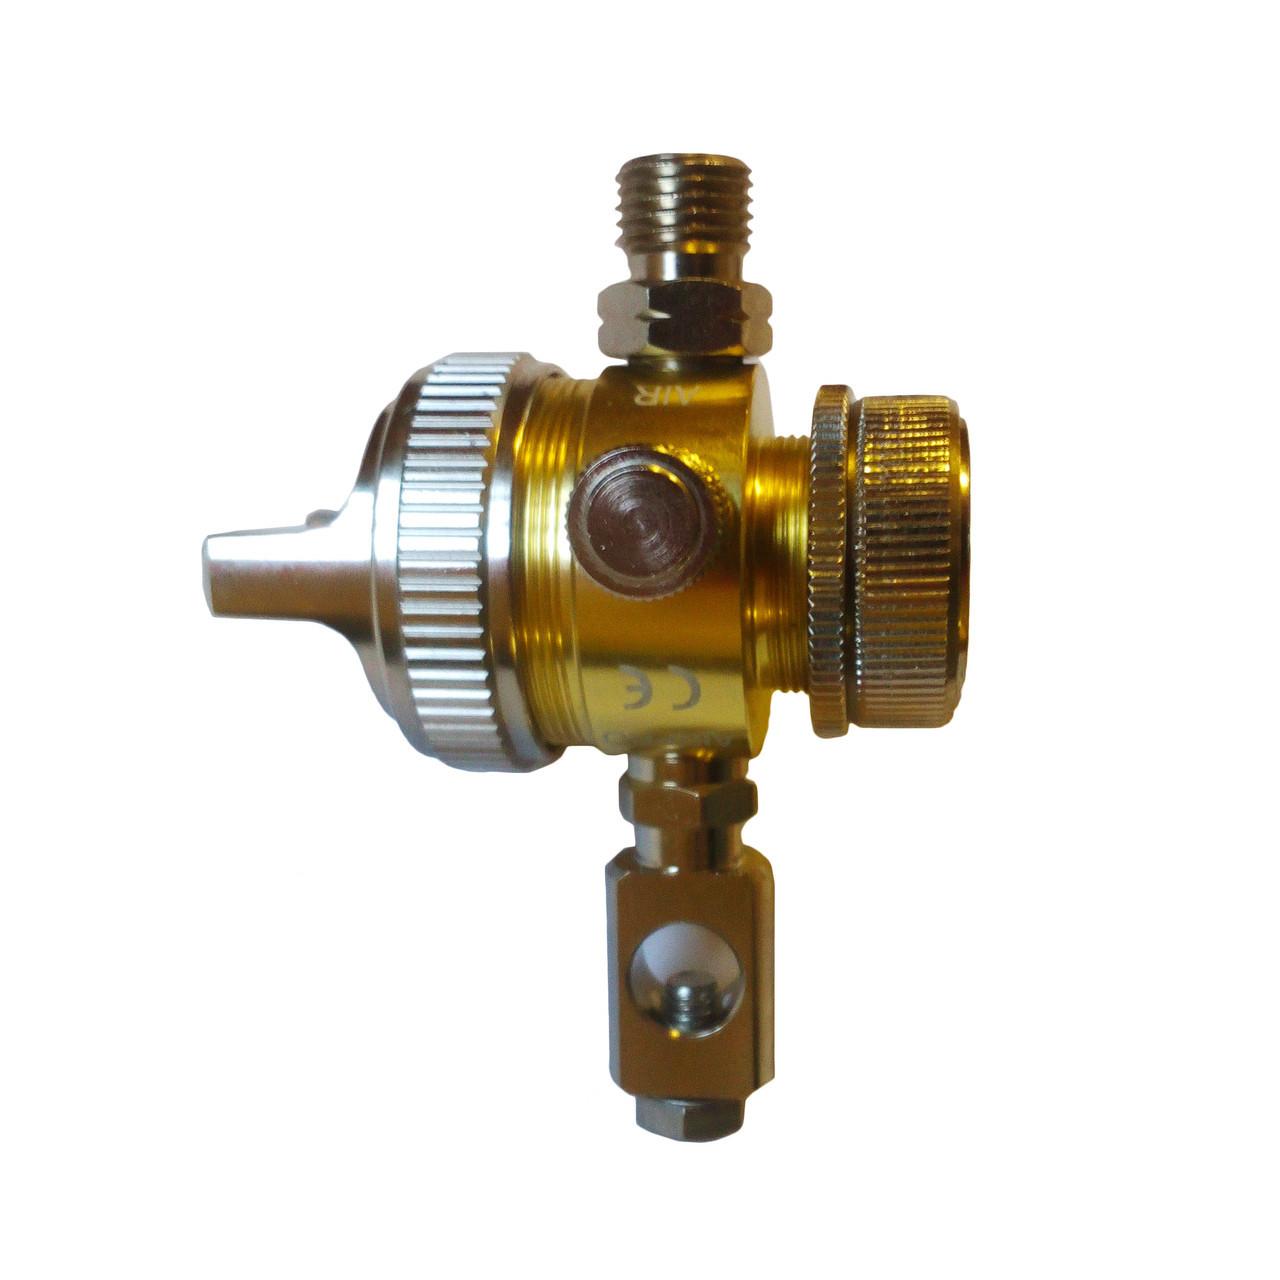 Краскопульт пневматический автоматический Air Pro HW-AG3 - 1.0 (Тайвань)